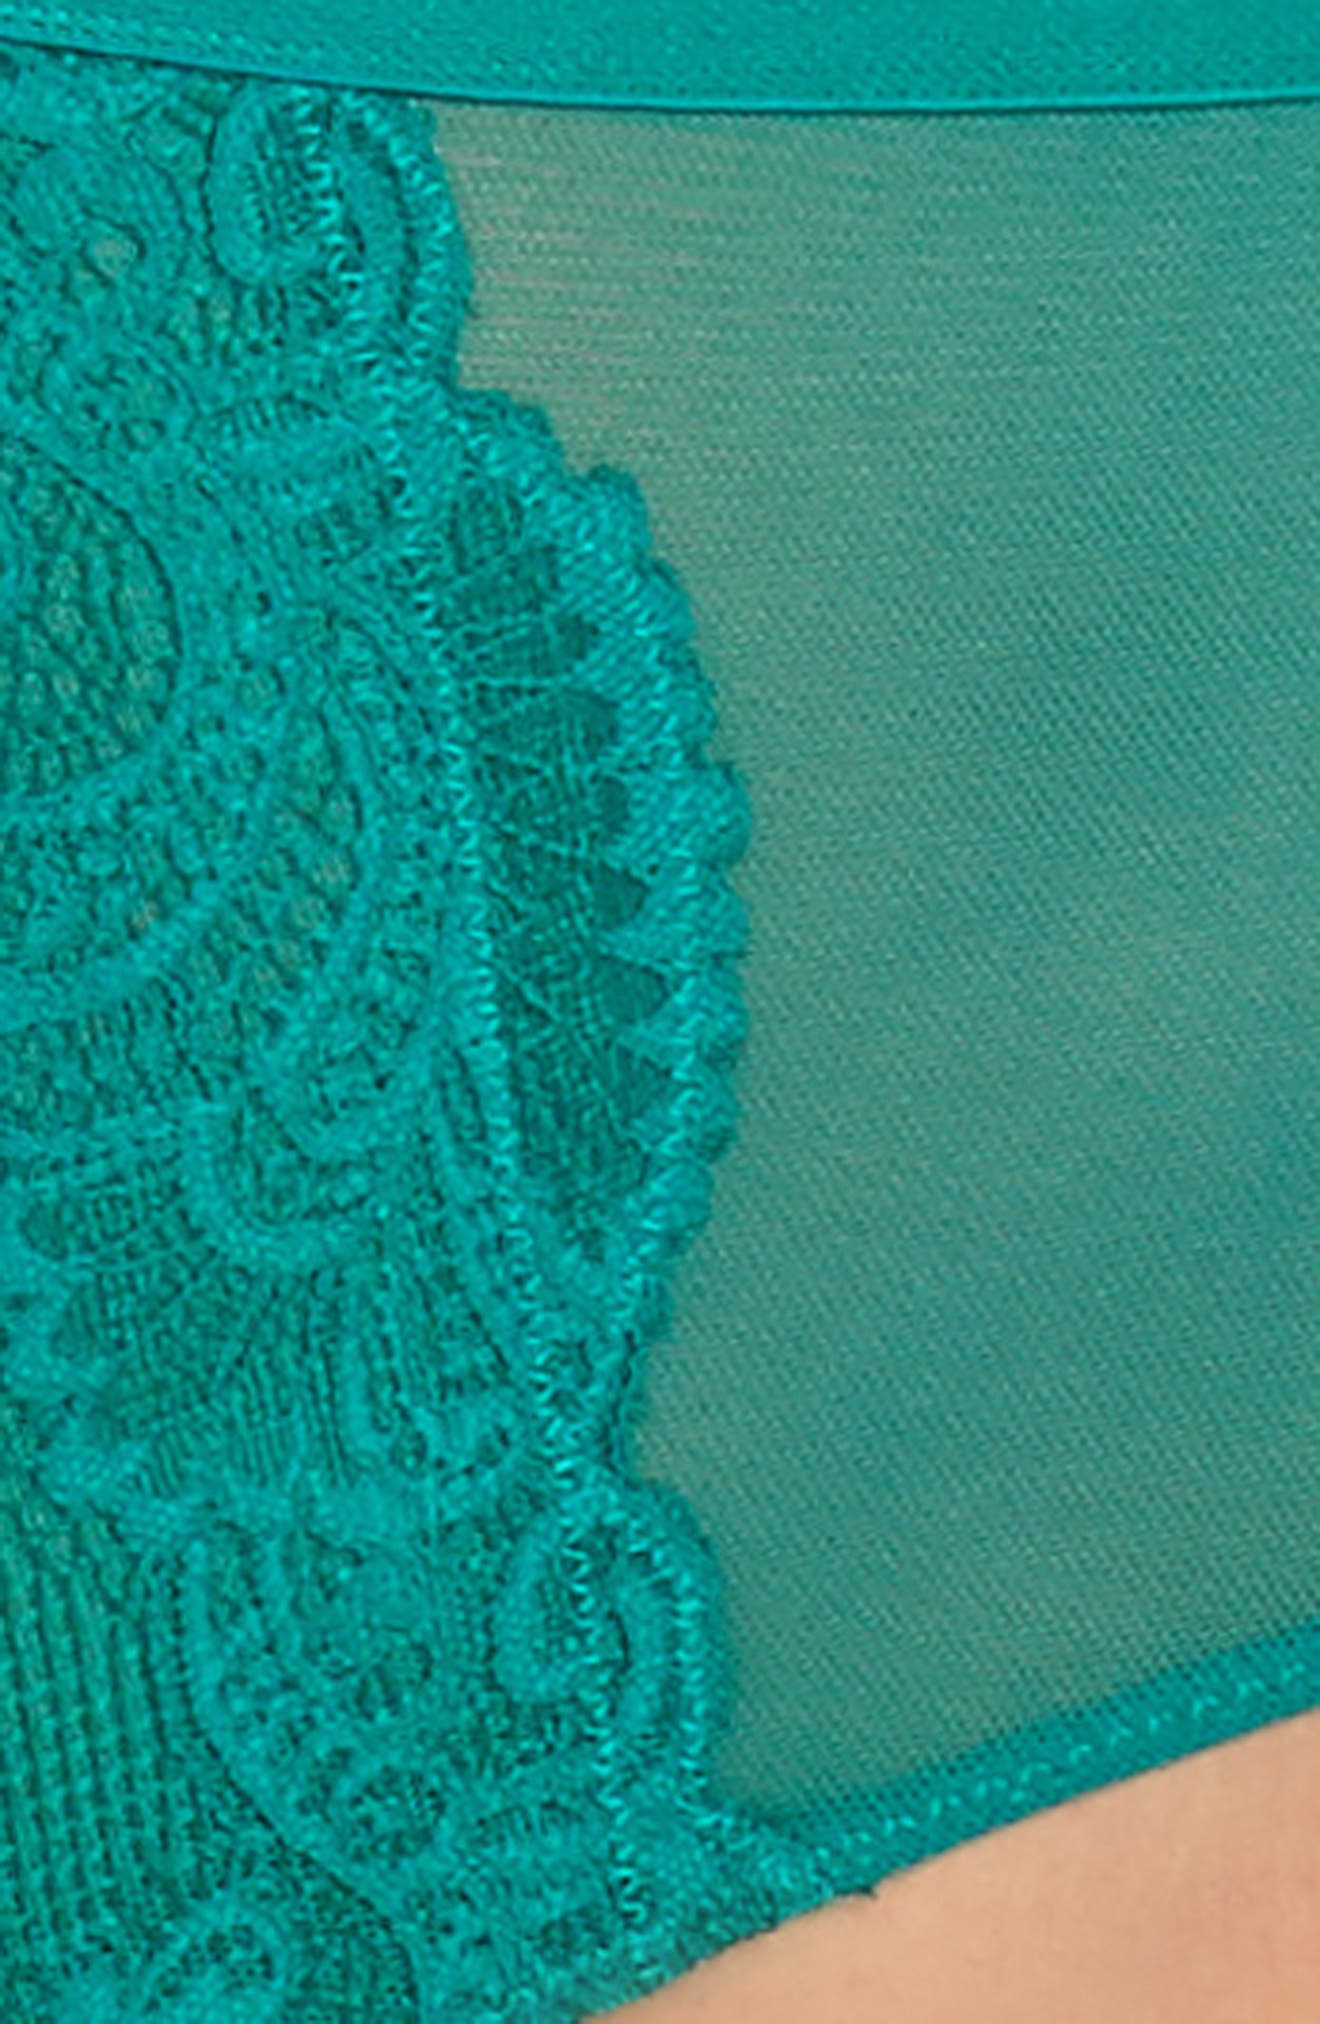 Intimately FP Jasmine High Waist Briefs,                             Alternate thumbnail 18, color,